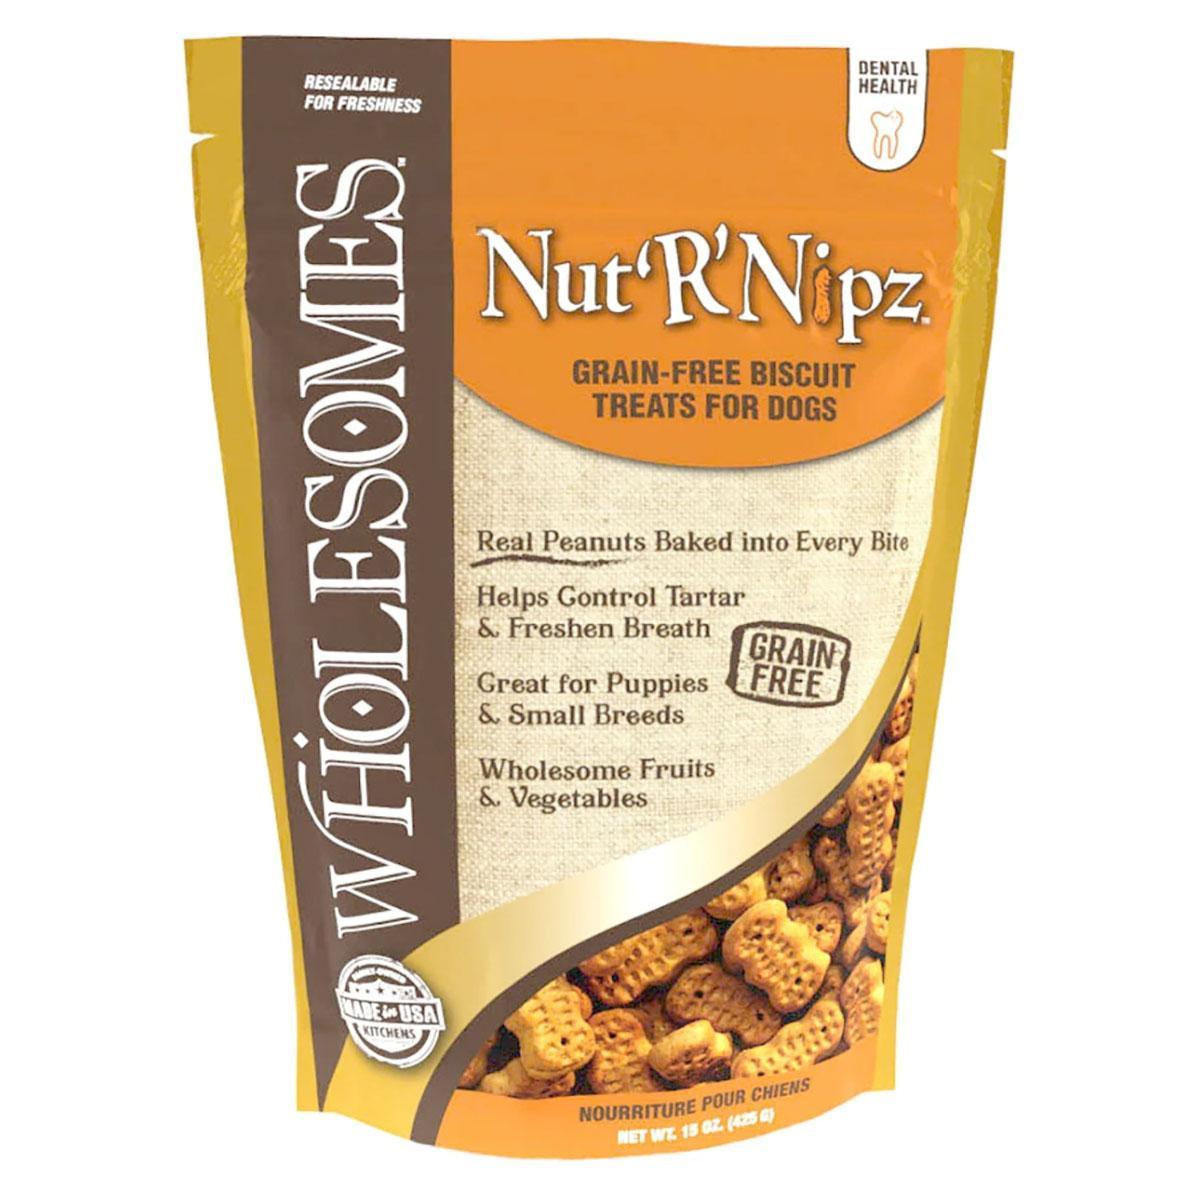 Sportmix Wholesomes Grain-Free Biscuit Dog Treat - Nut'R'Nipz